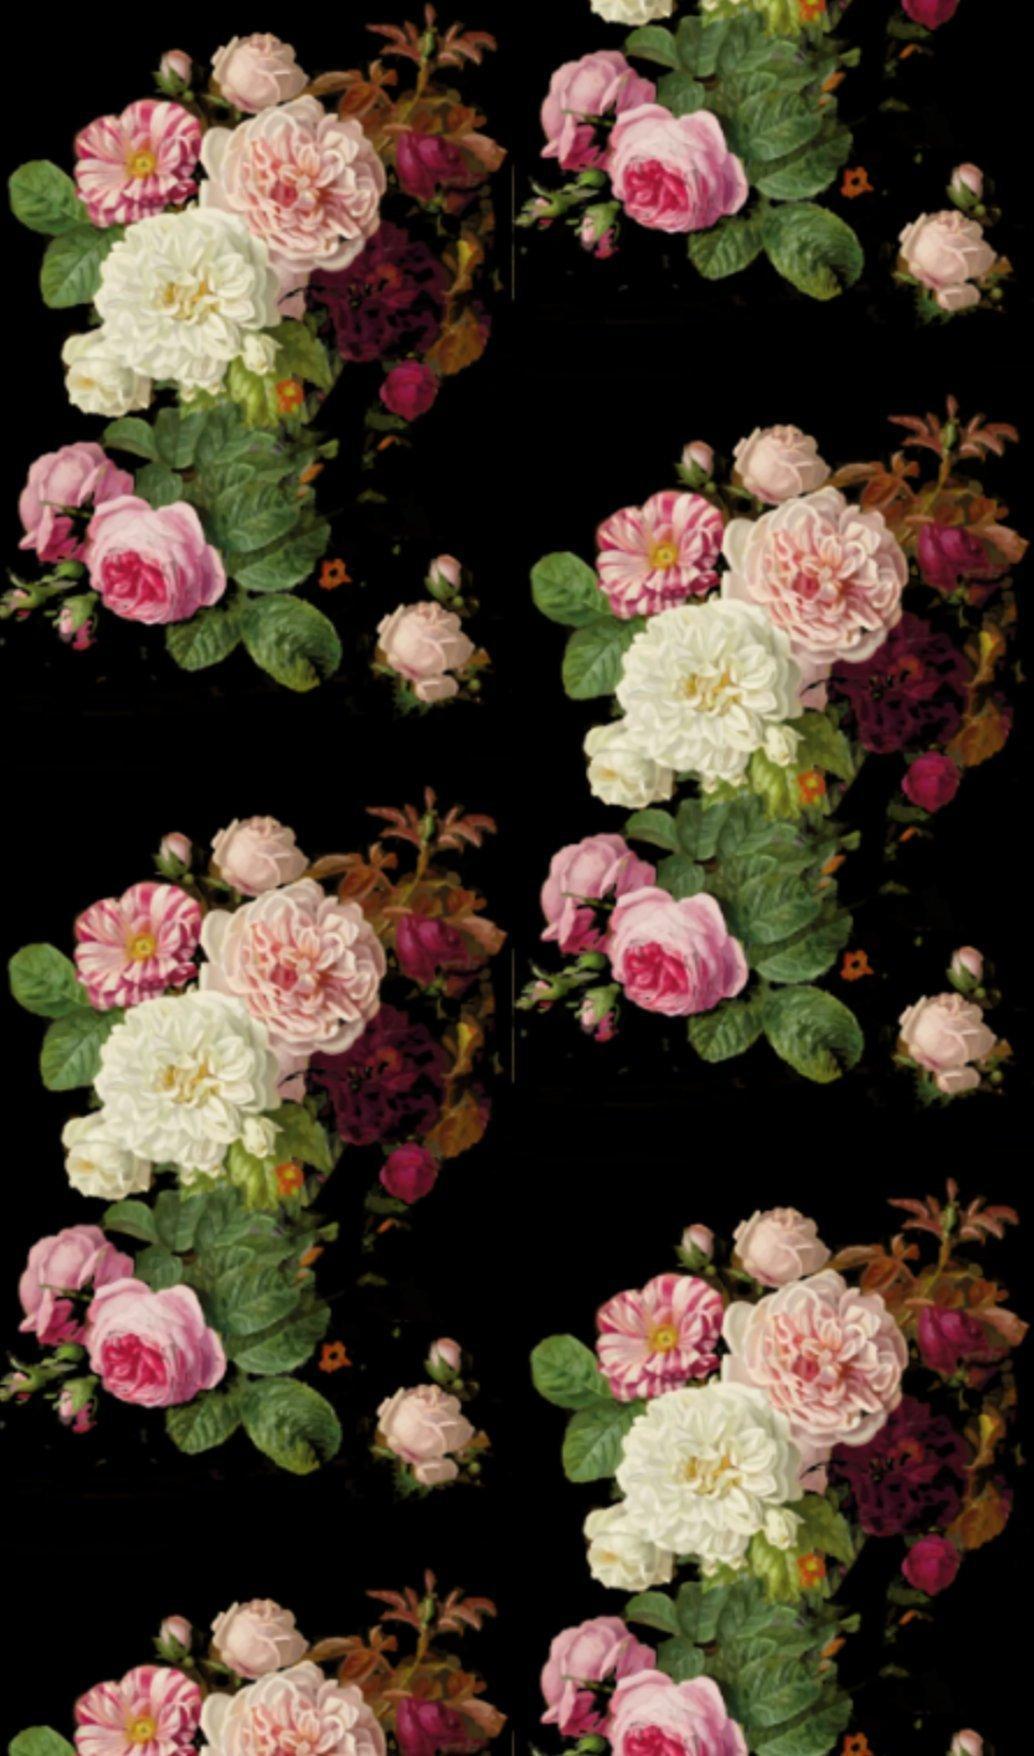 Vintage Floral Wallpapers Wallpaper Cave